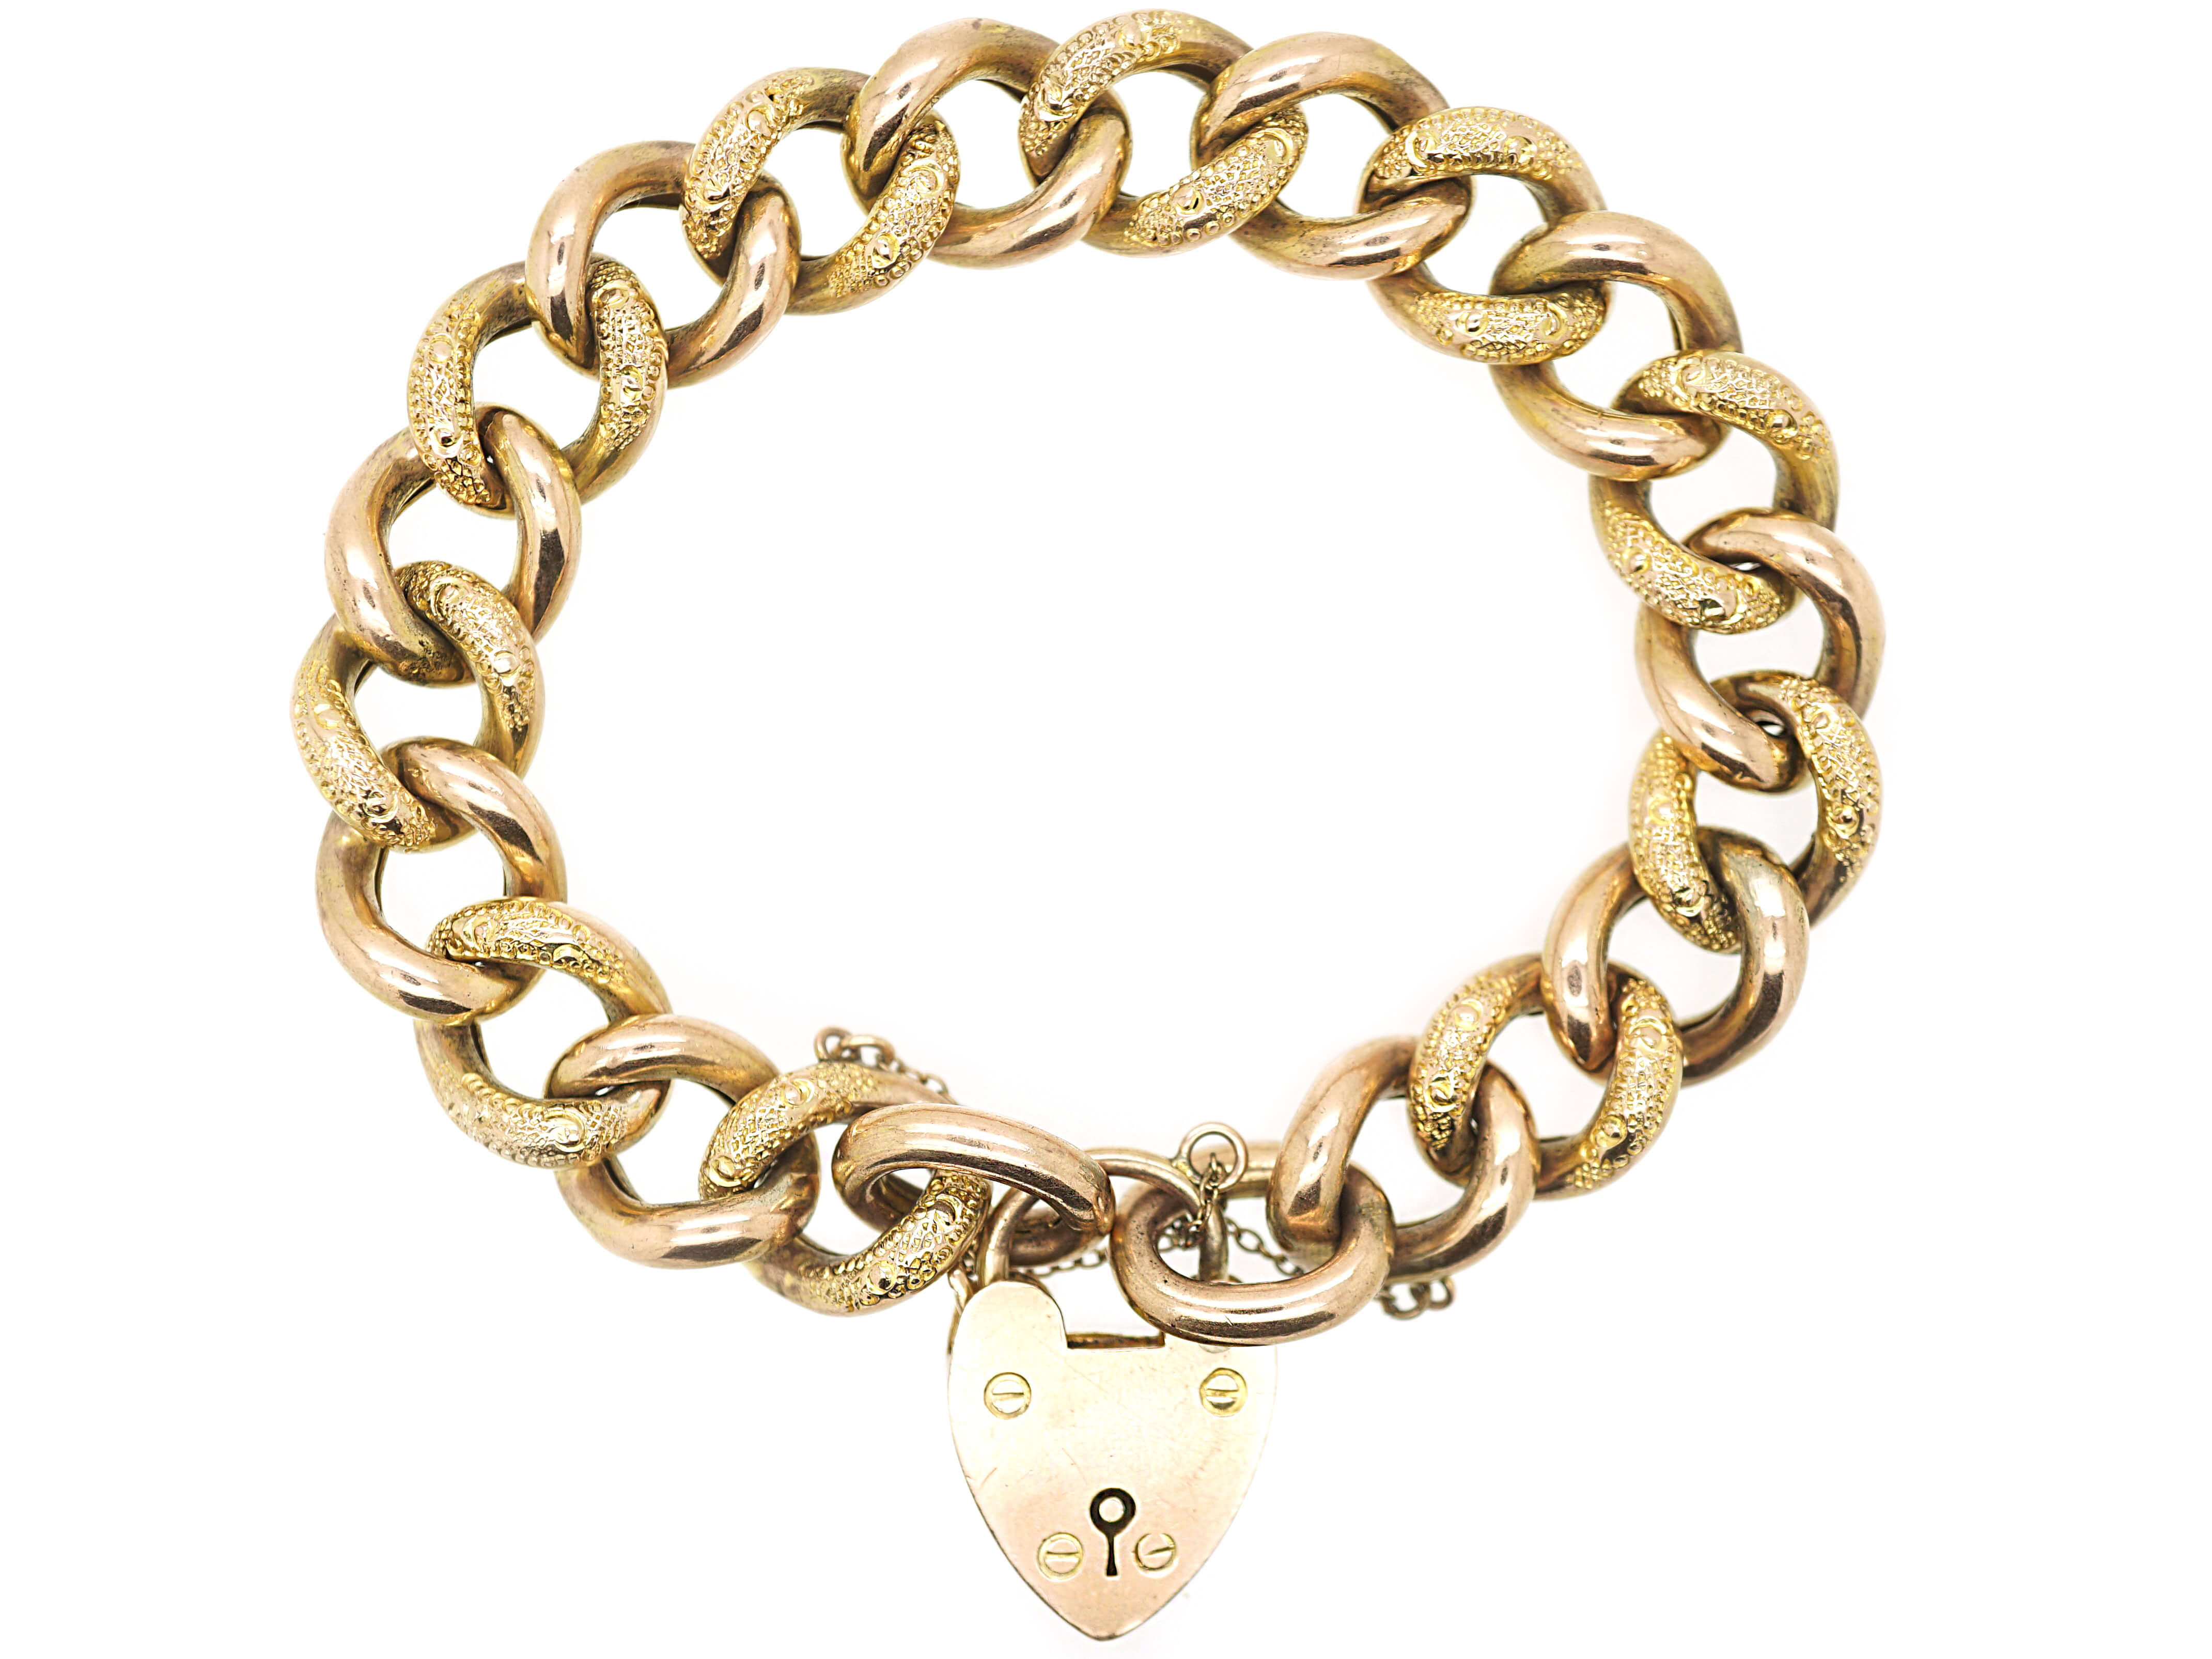 Edwardian 9ct Gold Alternate Plain & Decorated Link Curb Bracelet